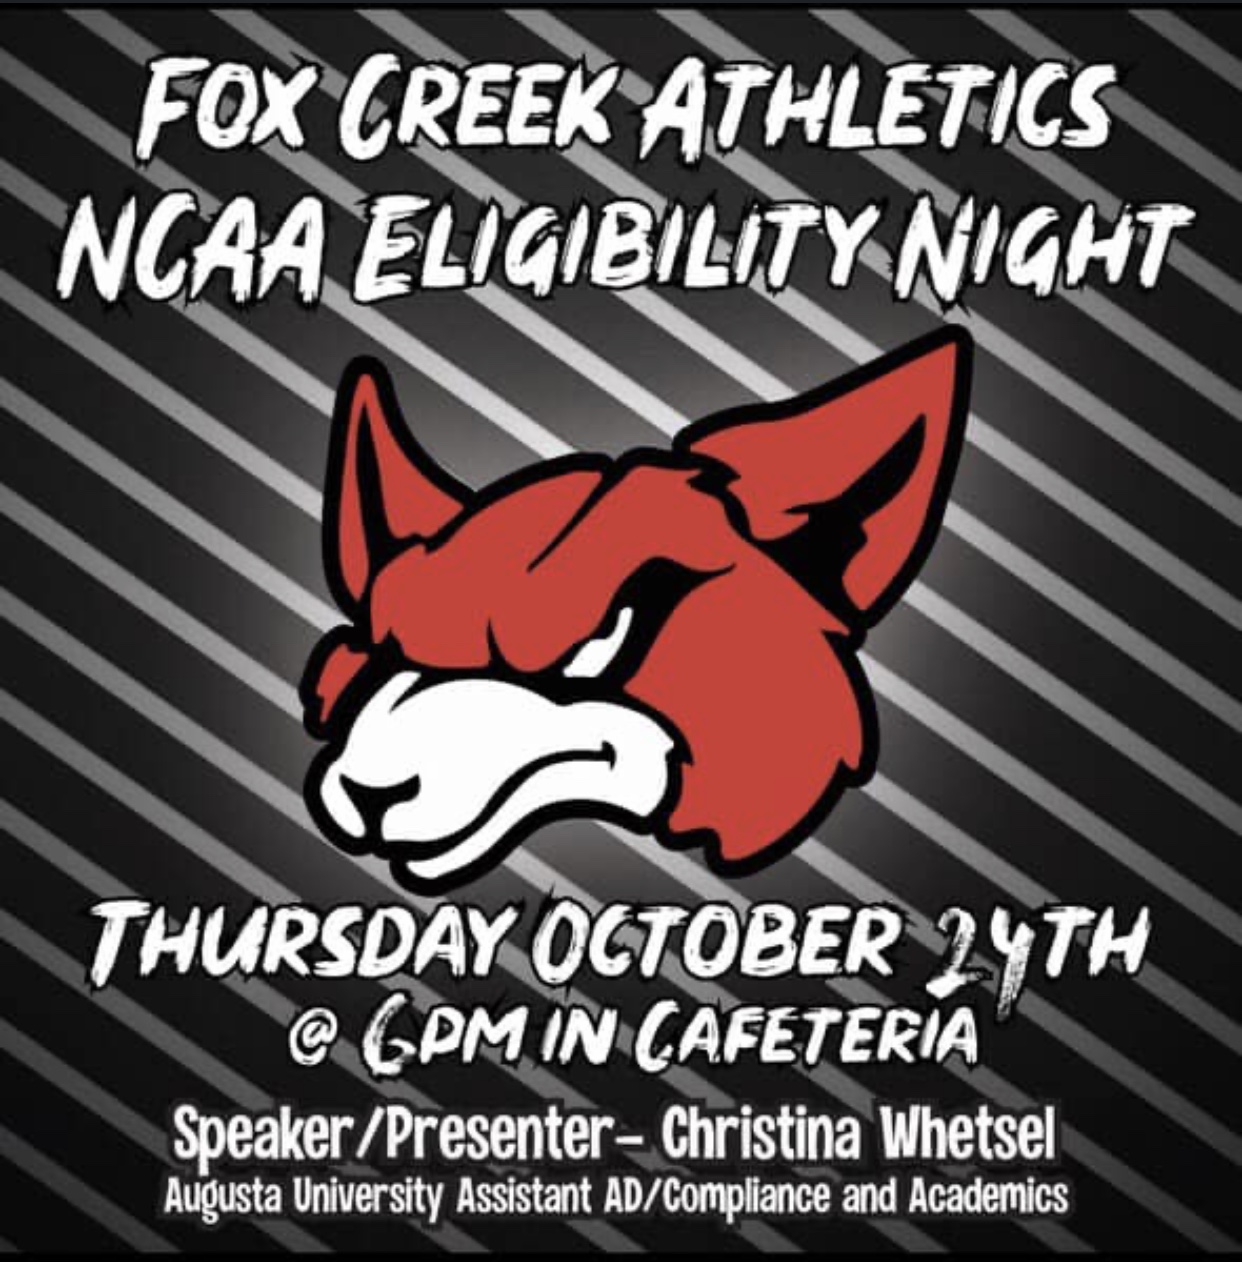 NCAA Eligibility Night Thursday, October 24th